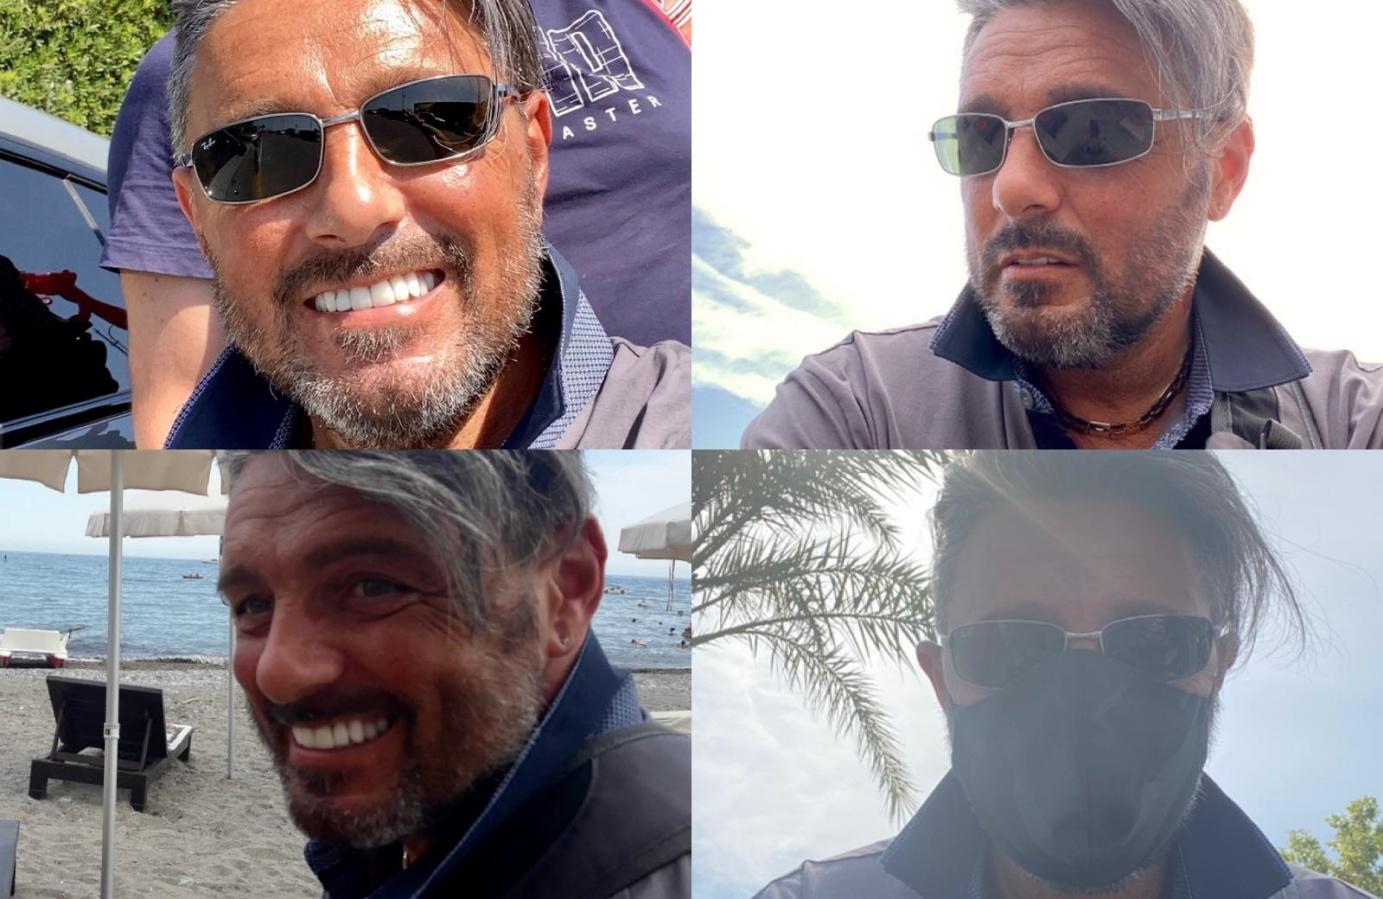 Antonino La Targia omicidio-suicidio